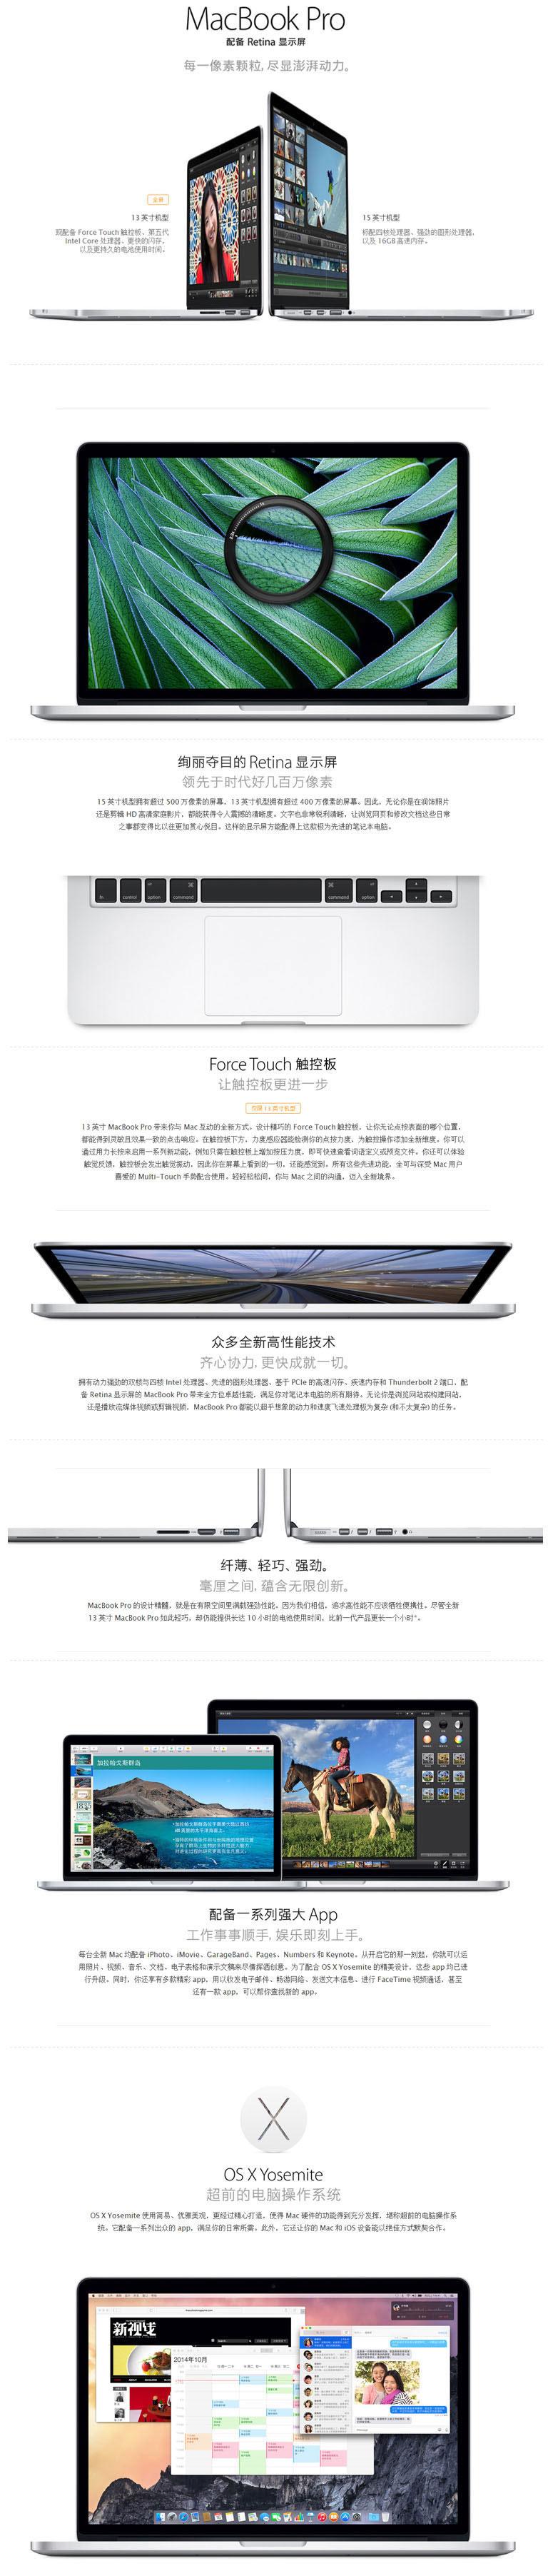 Apple Macbook Pro 笔记本电脑